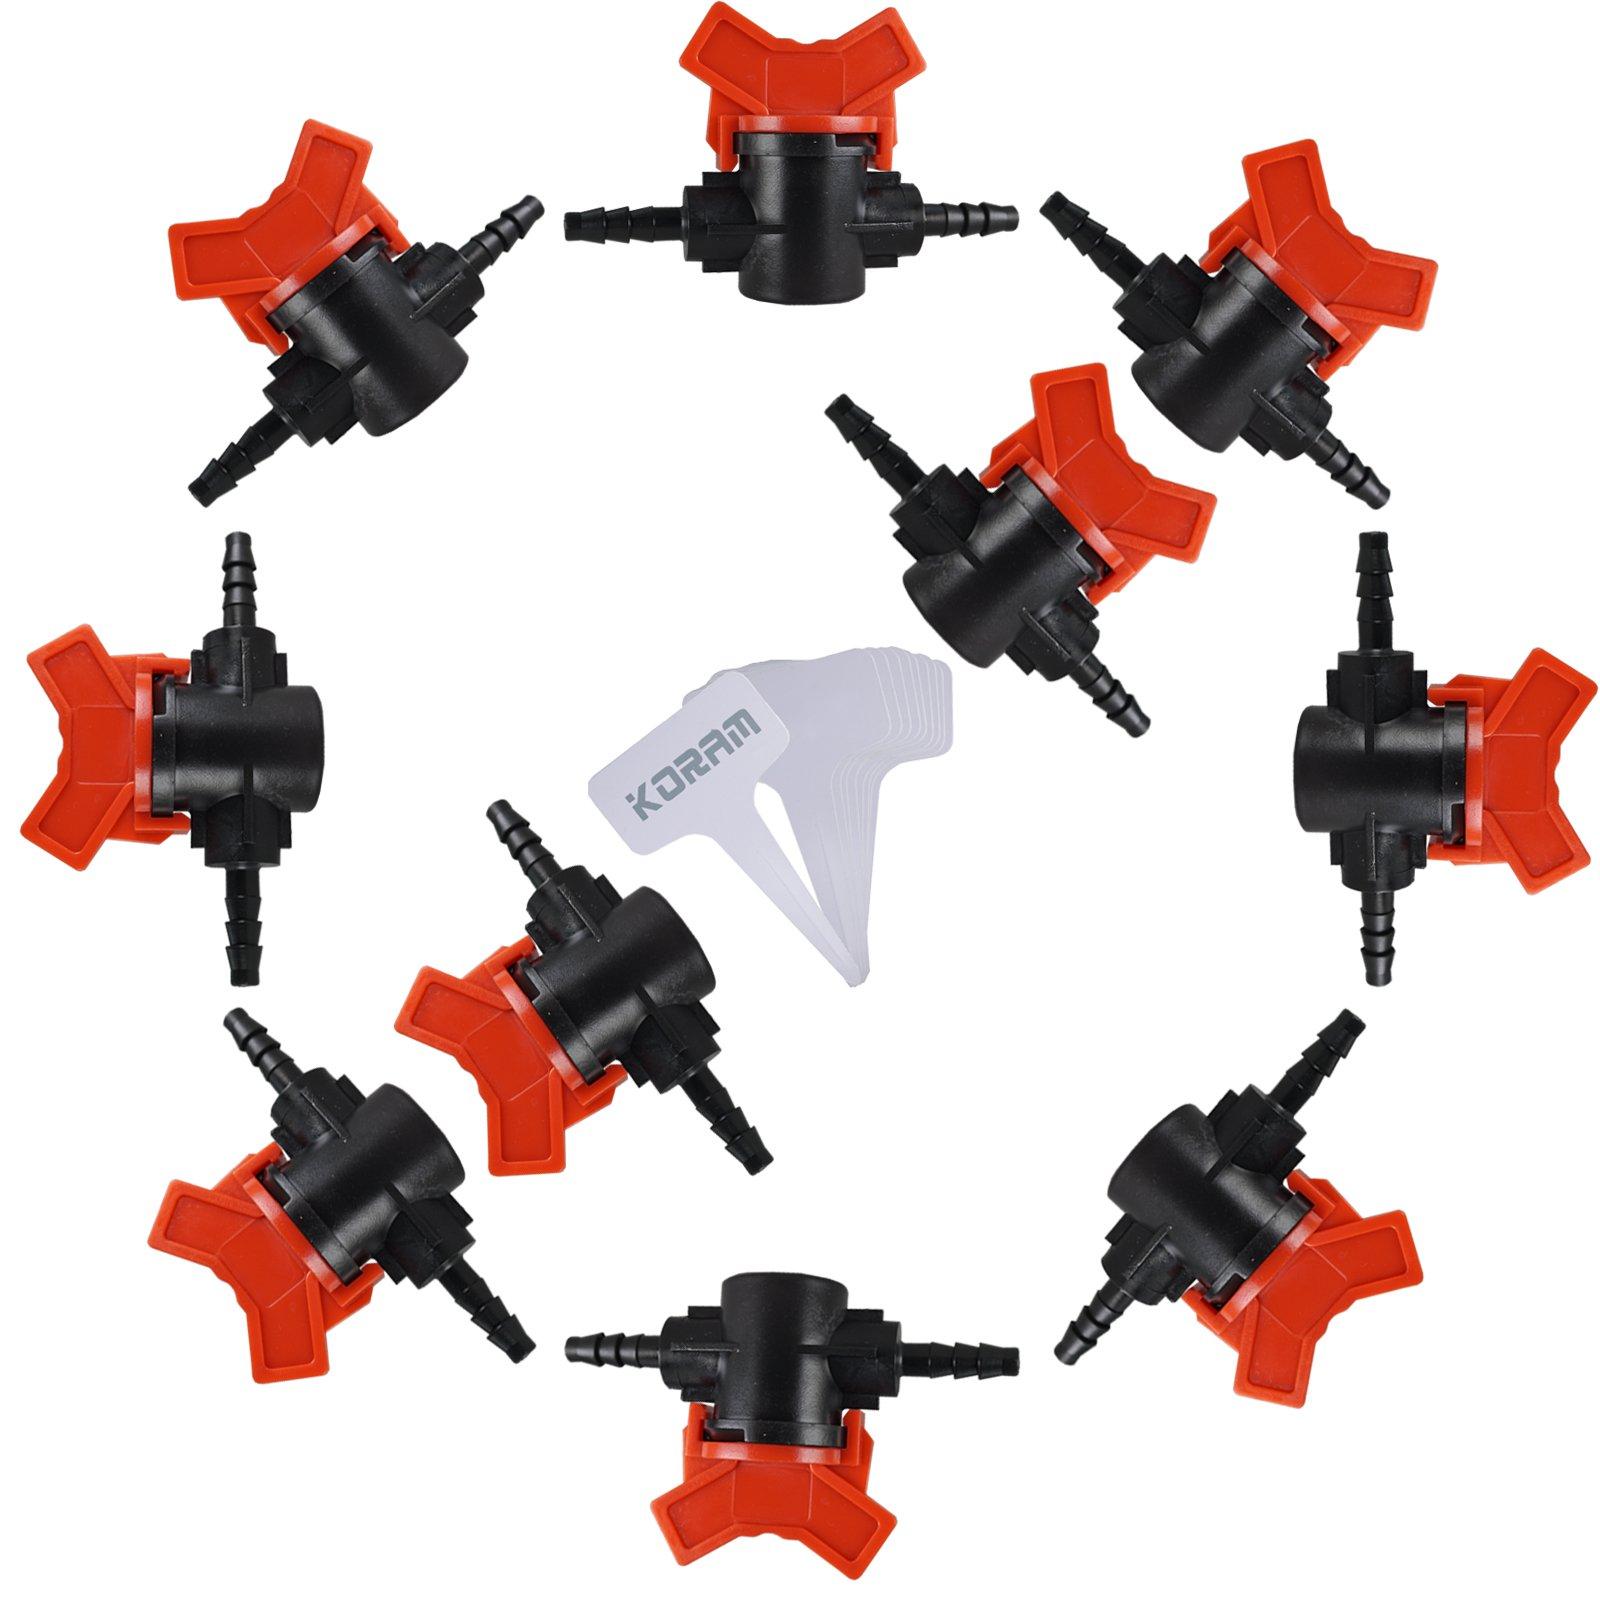 KORAM Drip Irrigation Barbed Valve Shut-off Valve for 1/4'' Tubing, set of 10(Gift:10PCS Plant Tag)